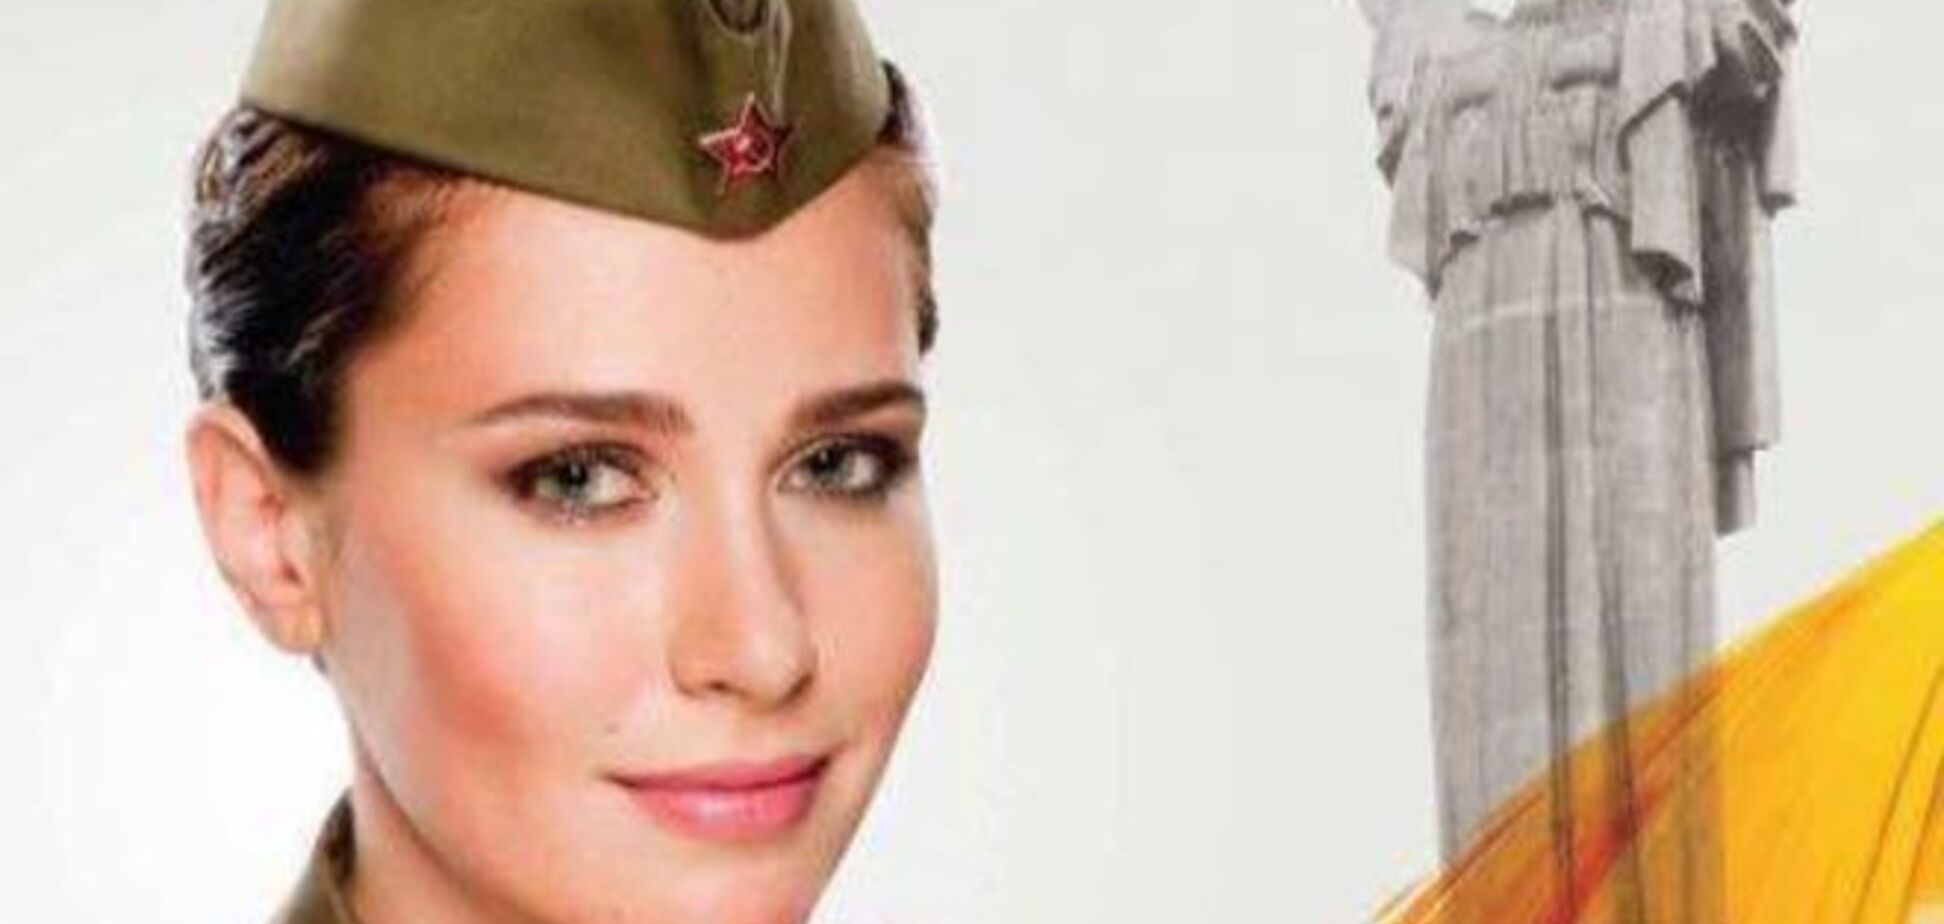 Экс-регионалка разместила фото к 9 мая в сепаратистско-националистических красках